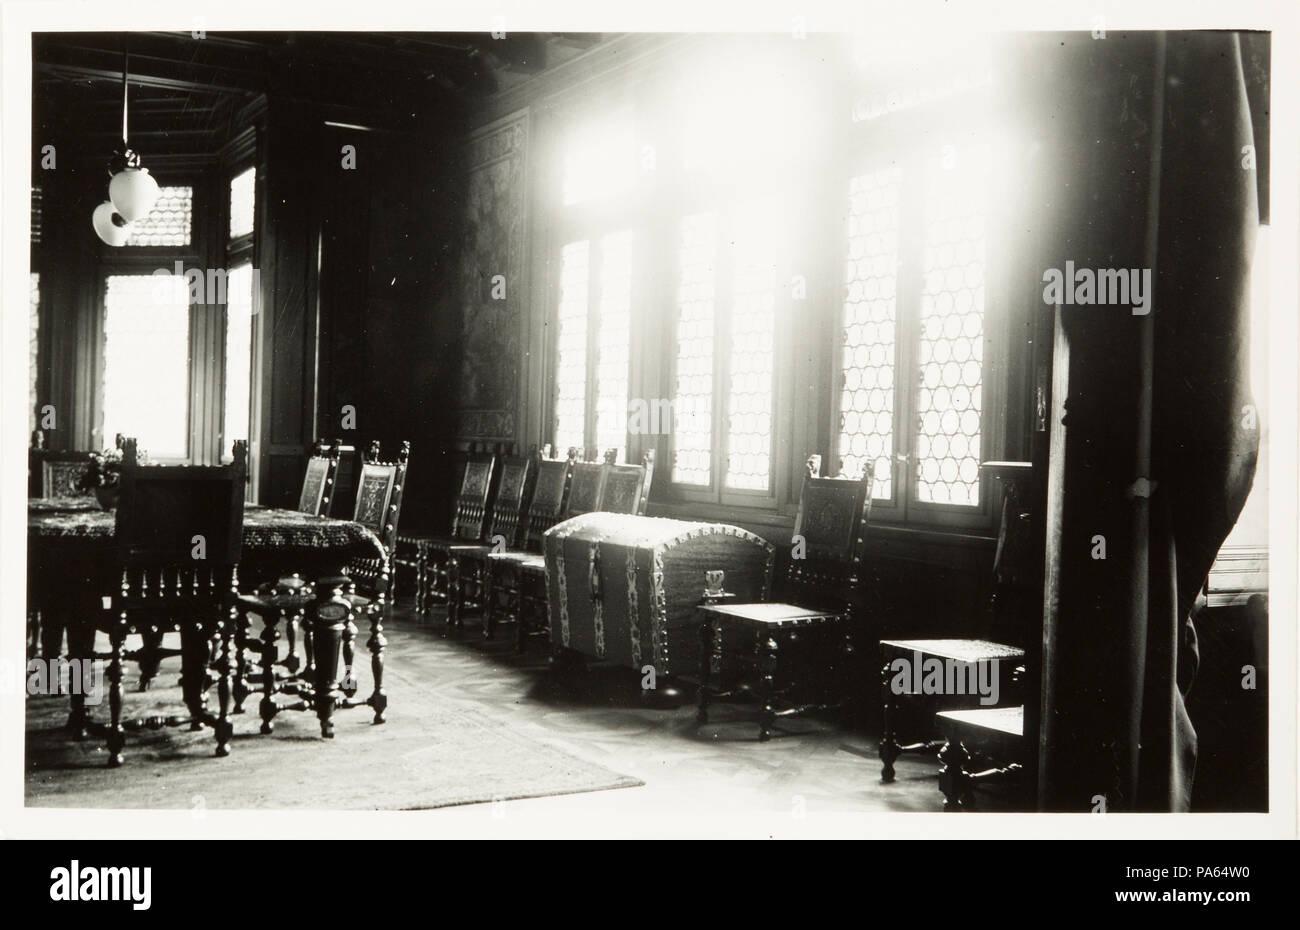 93 Fotografi, Matsal i f.d Stor Villan, som byggdes av Greve W. v. Hallwyl - Hallwylska museet - 108008 - Stock Image